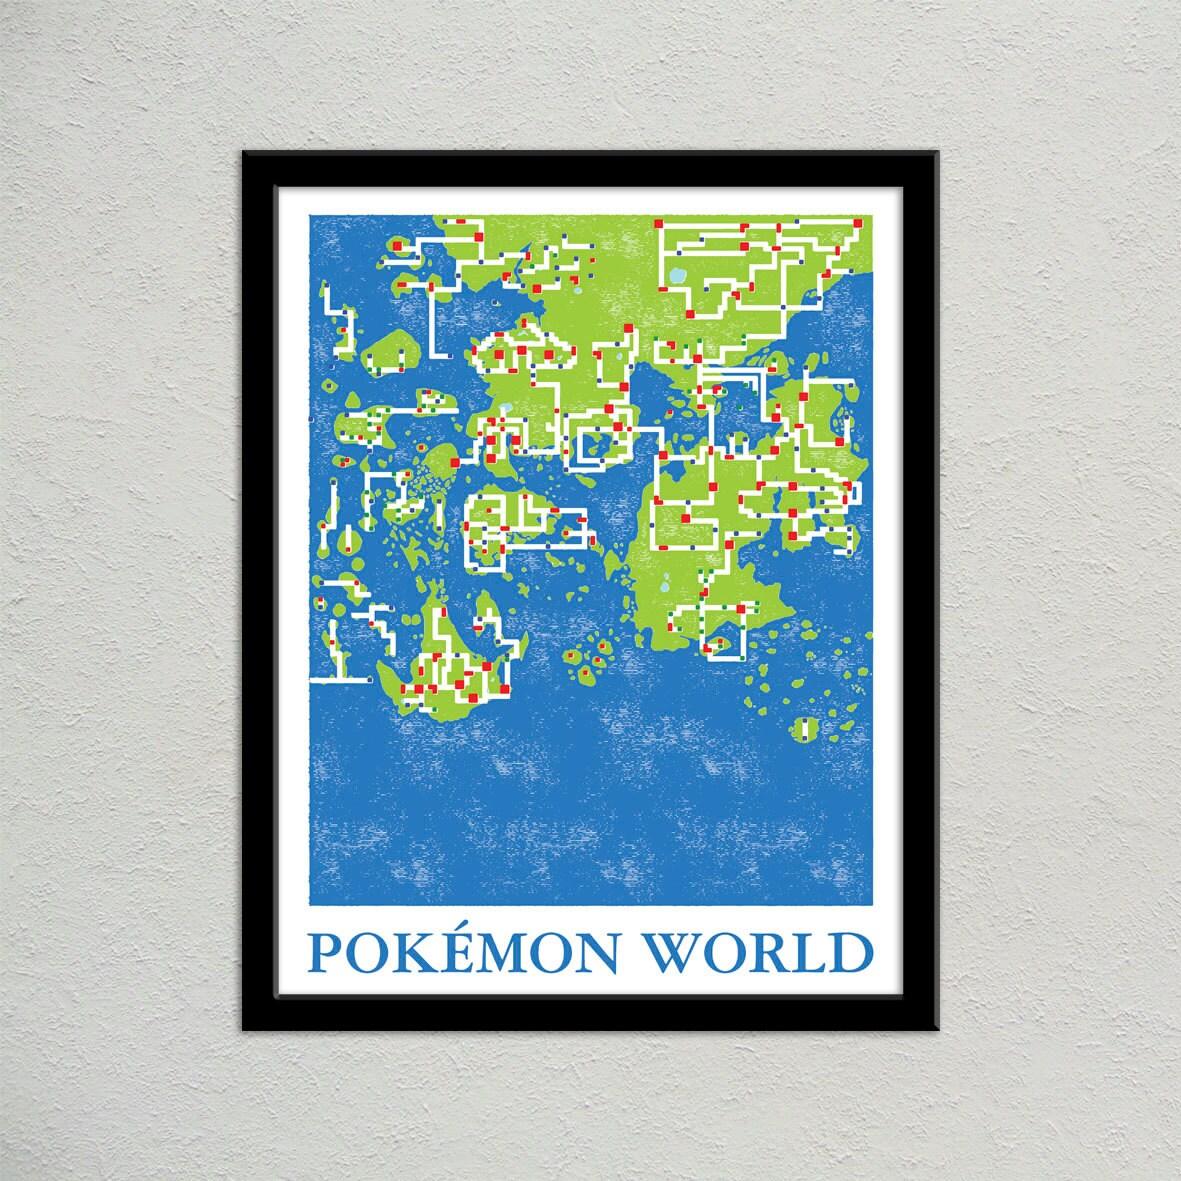 Pokemon world map print pokemon travel poster geek gift zoom gumiabroncs Gallery